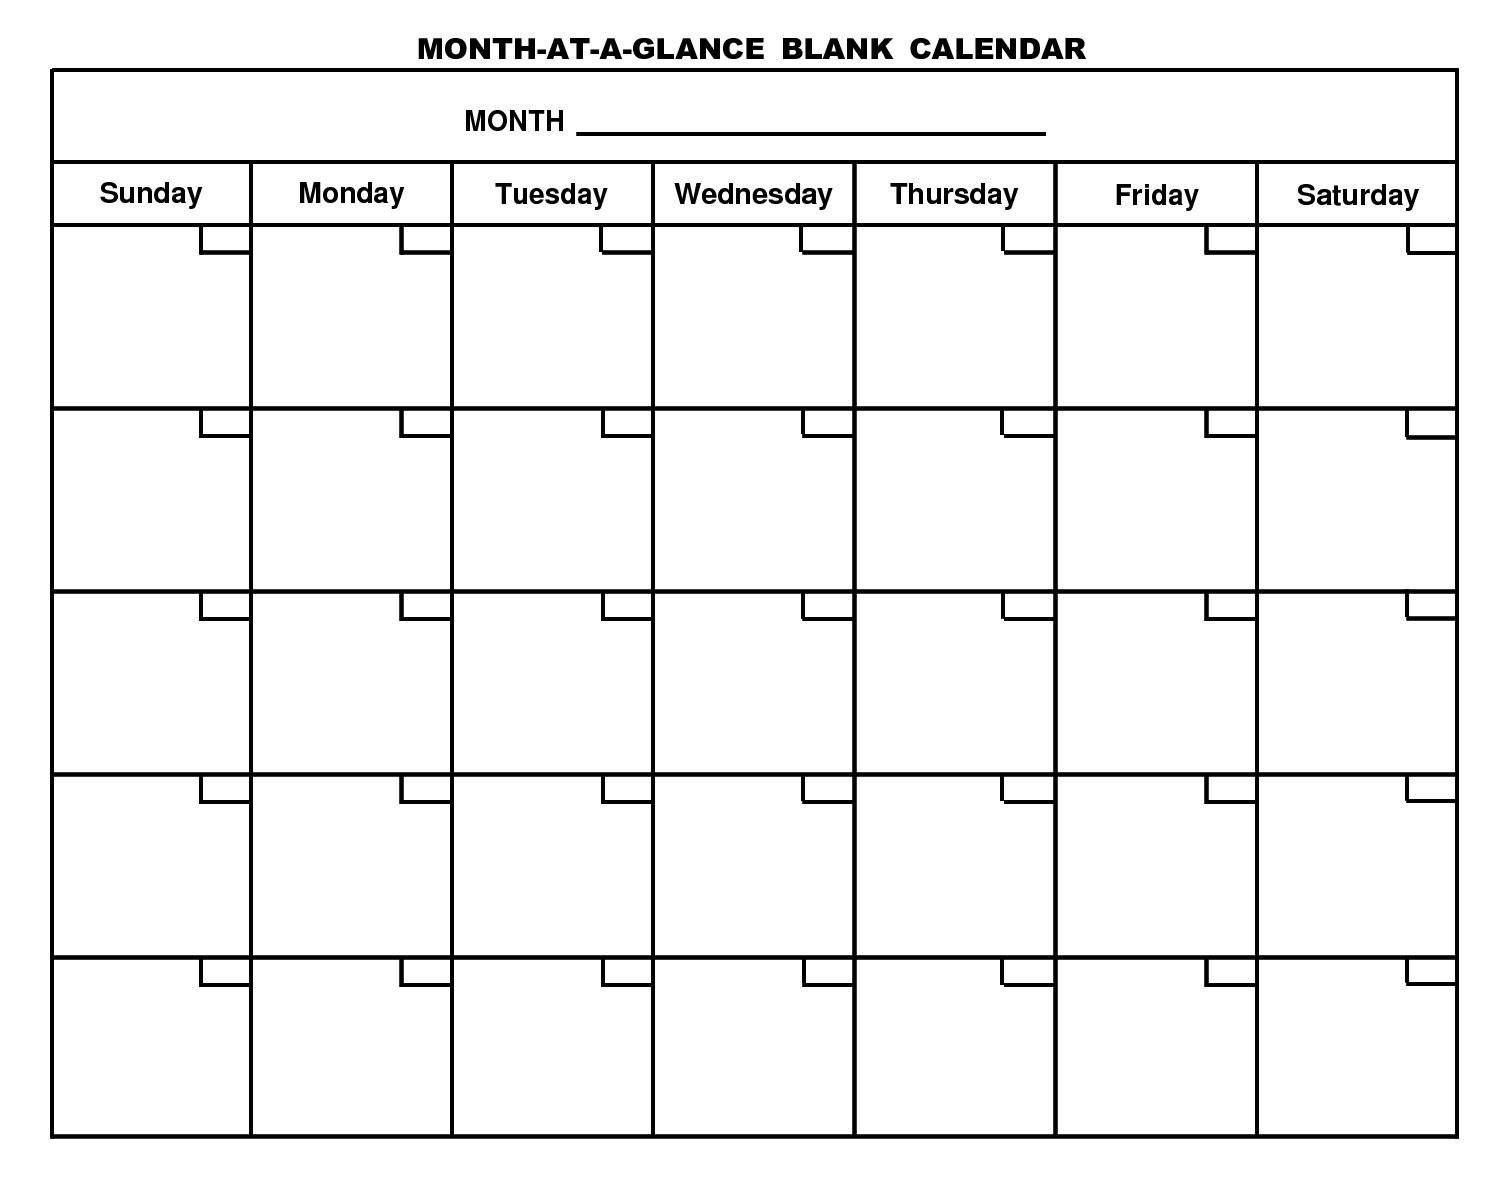 build a saturday to friday monthly calendar   calendar